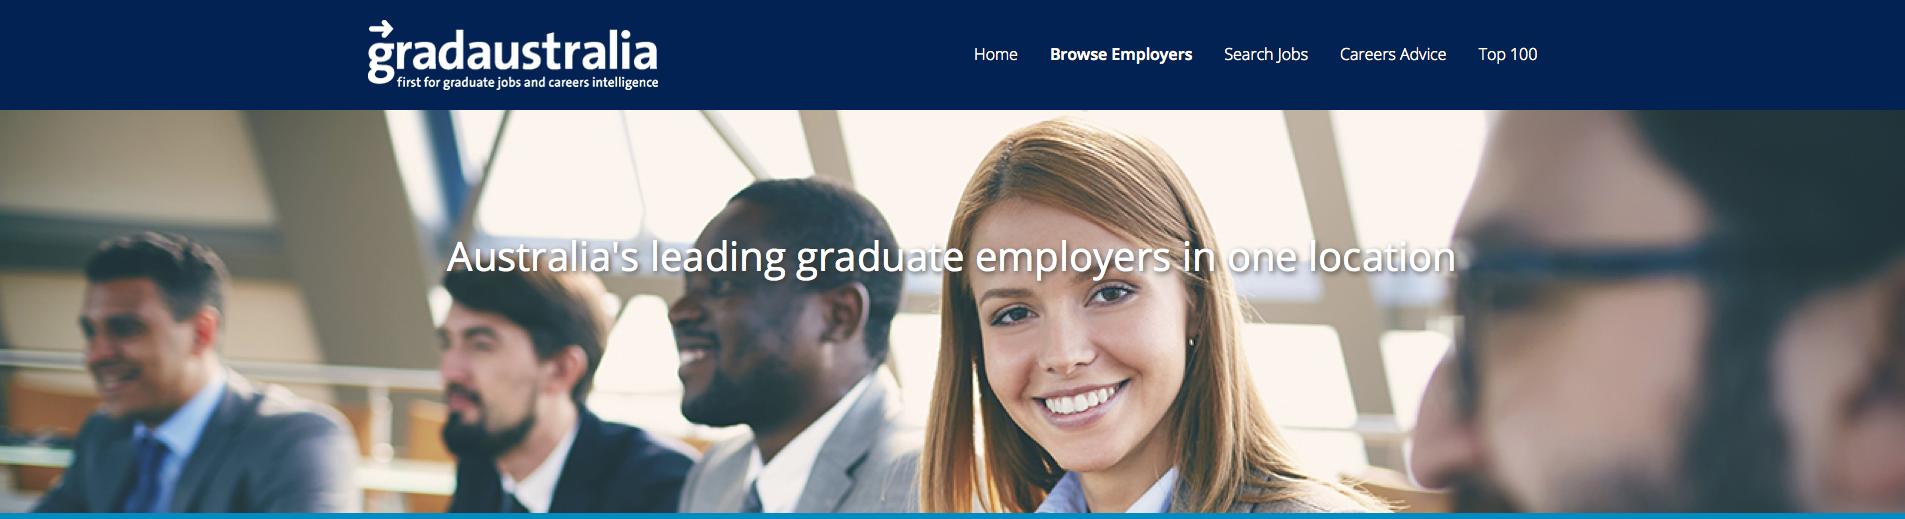 GradAustralia website